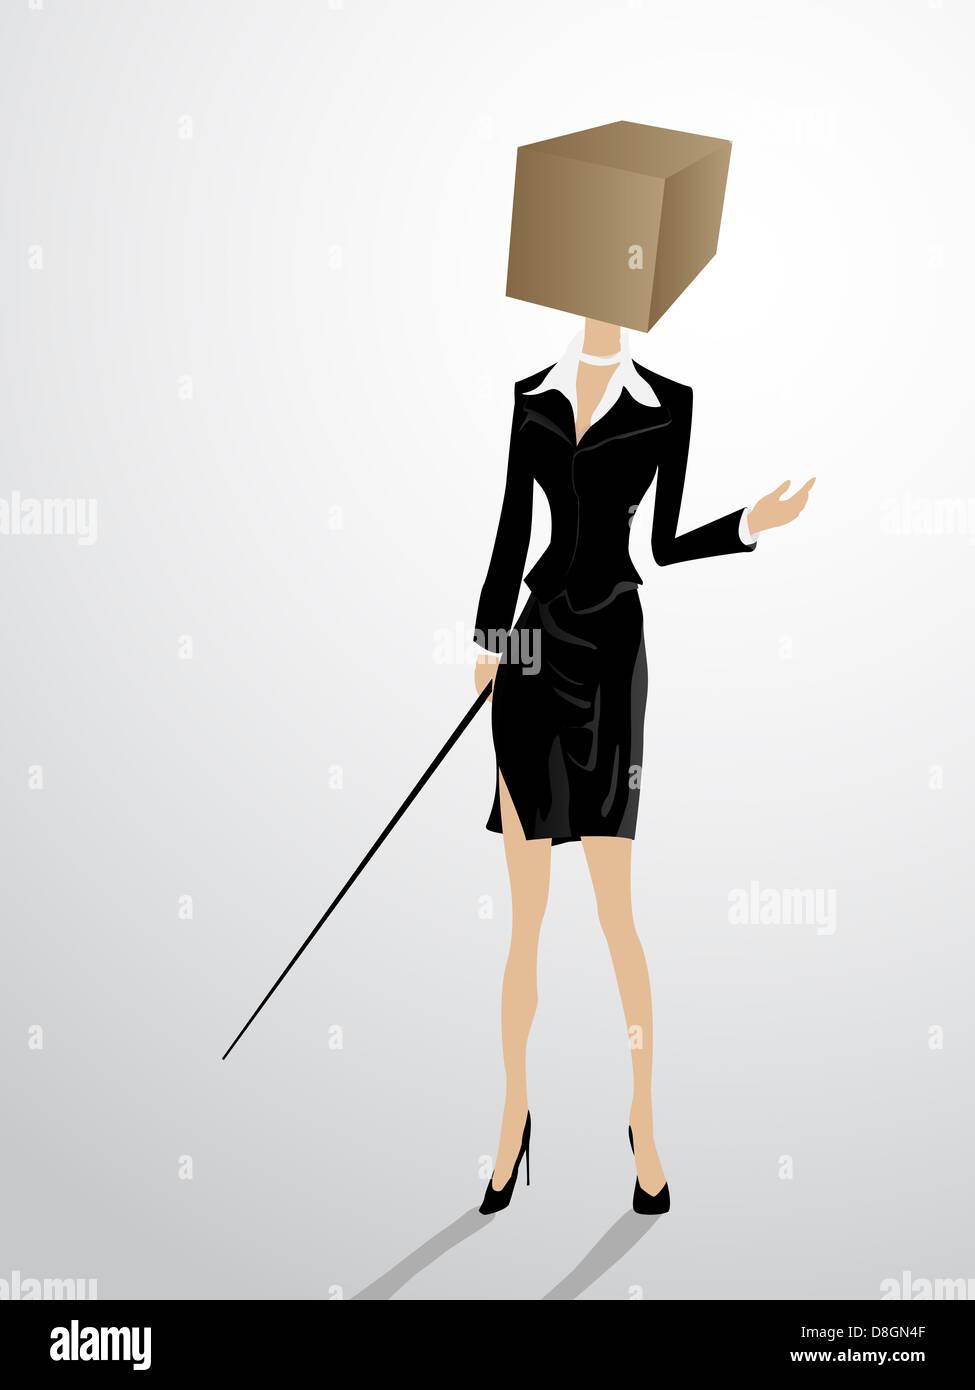 Square head - Stock Image